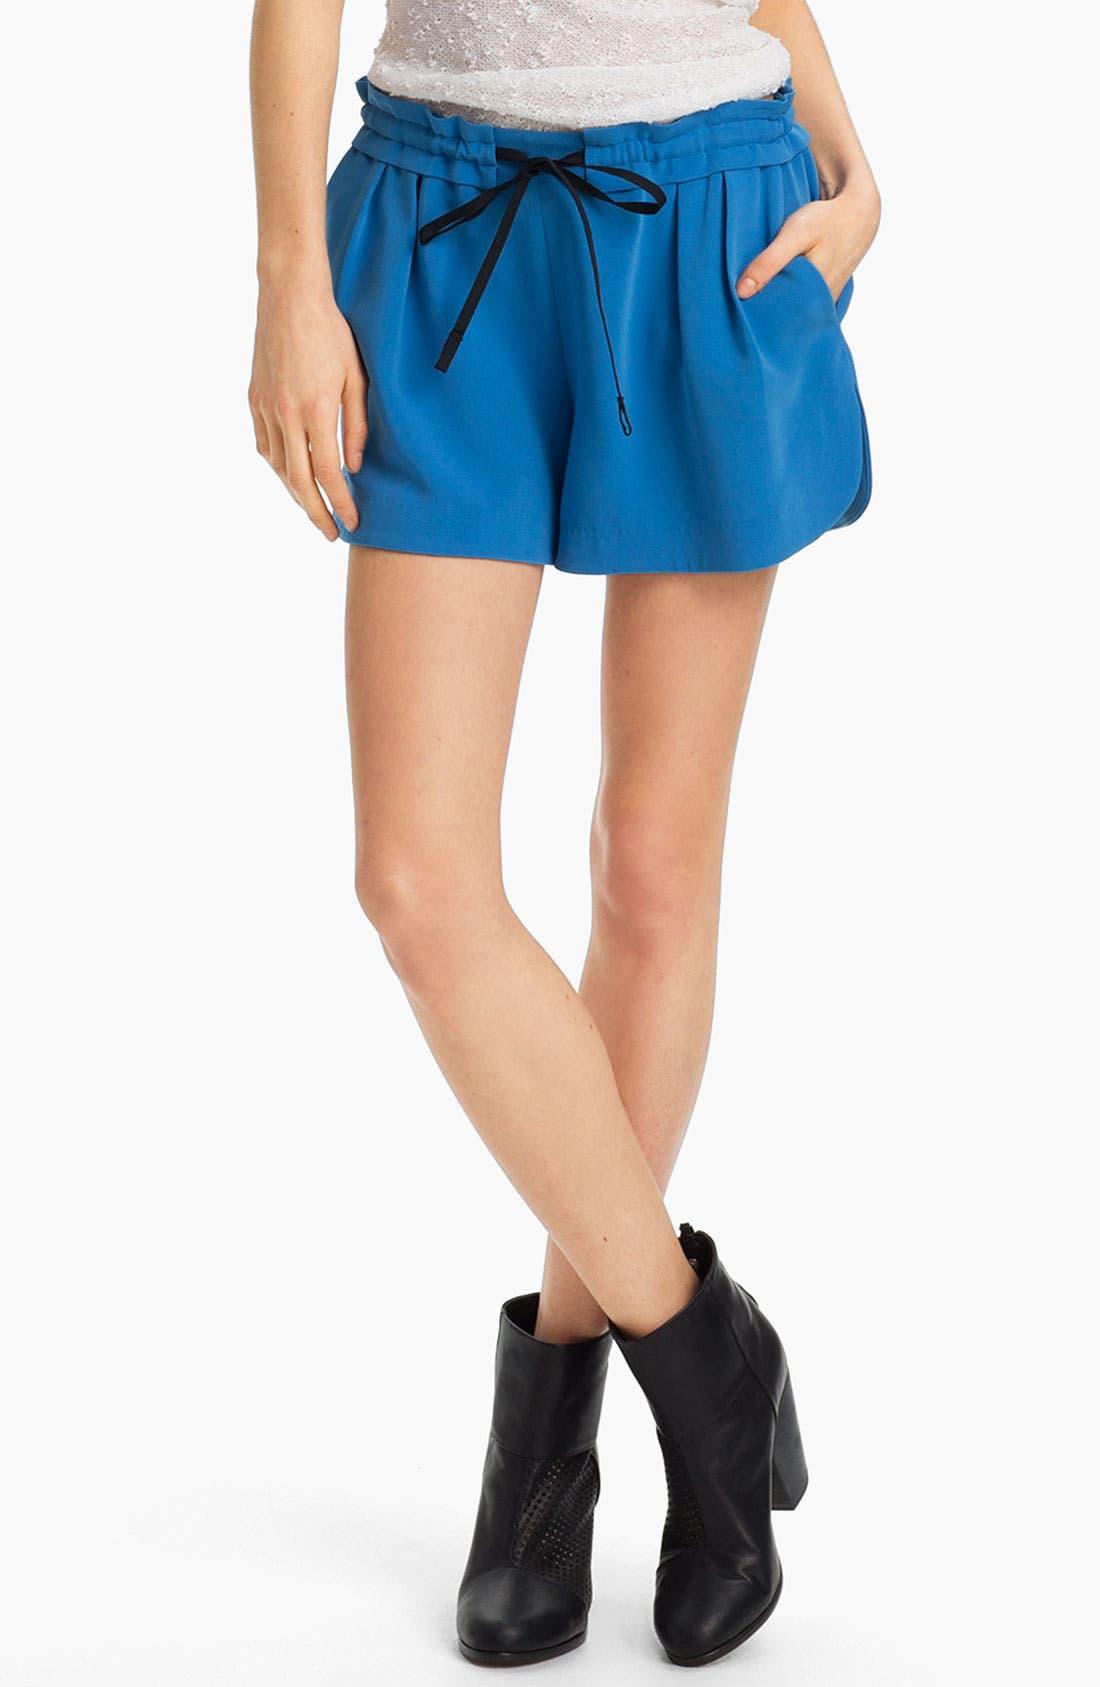 Alternate Image 1 Selected - rag & bone 'Ivette' Drawstring Shorts